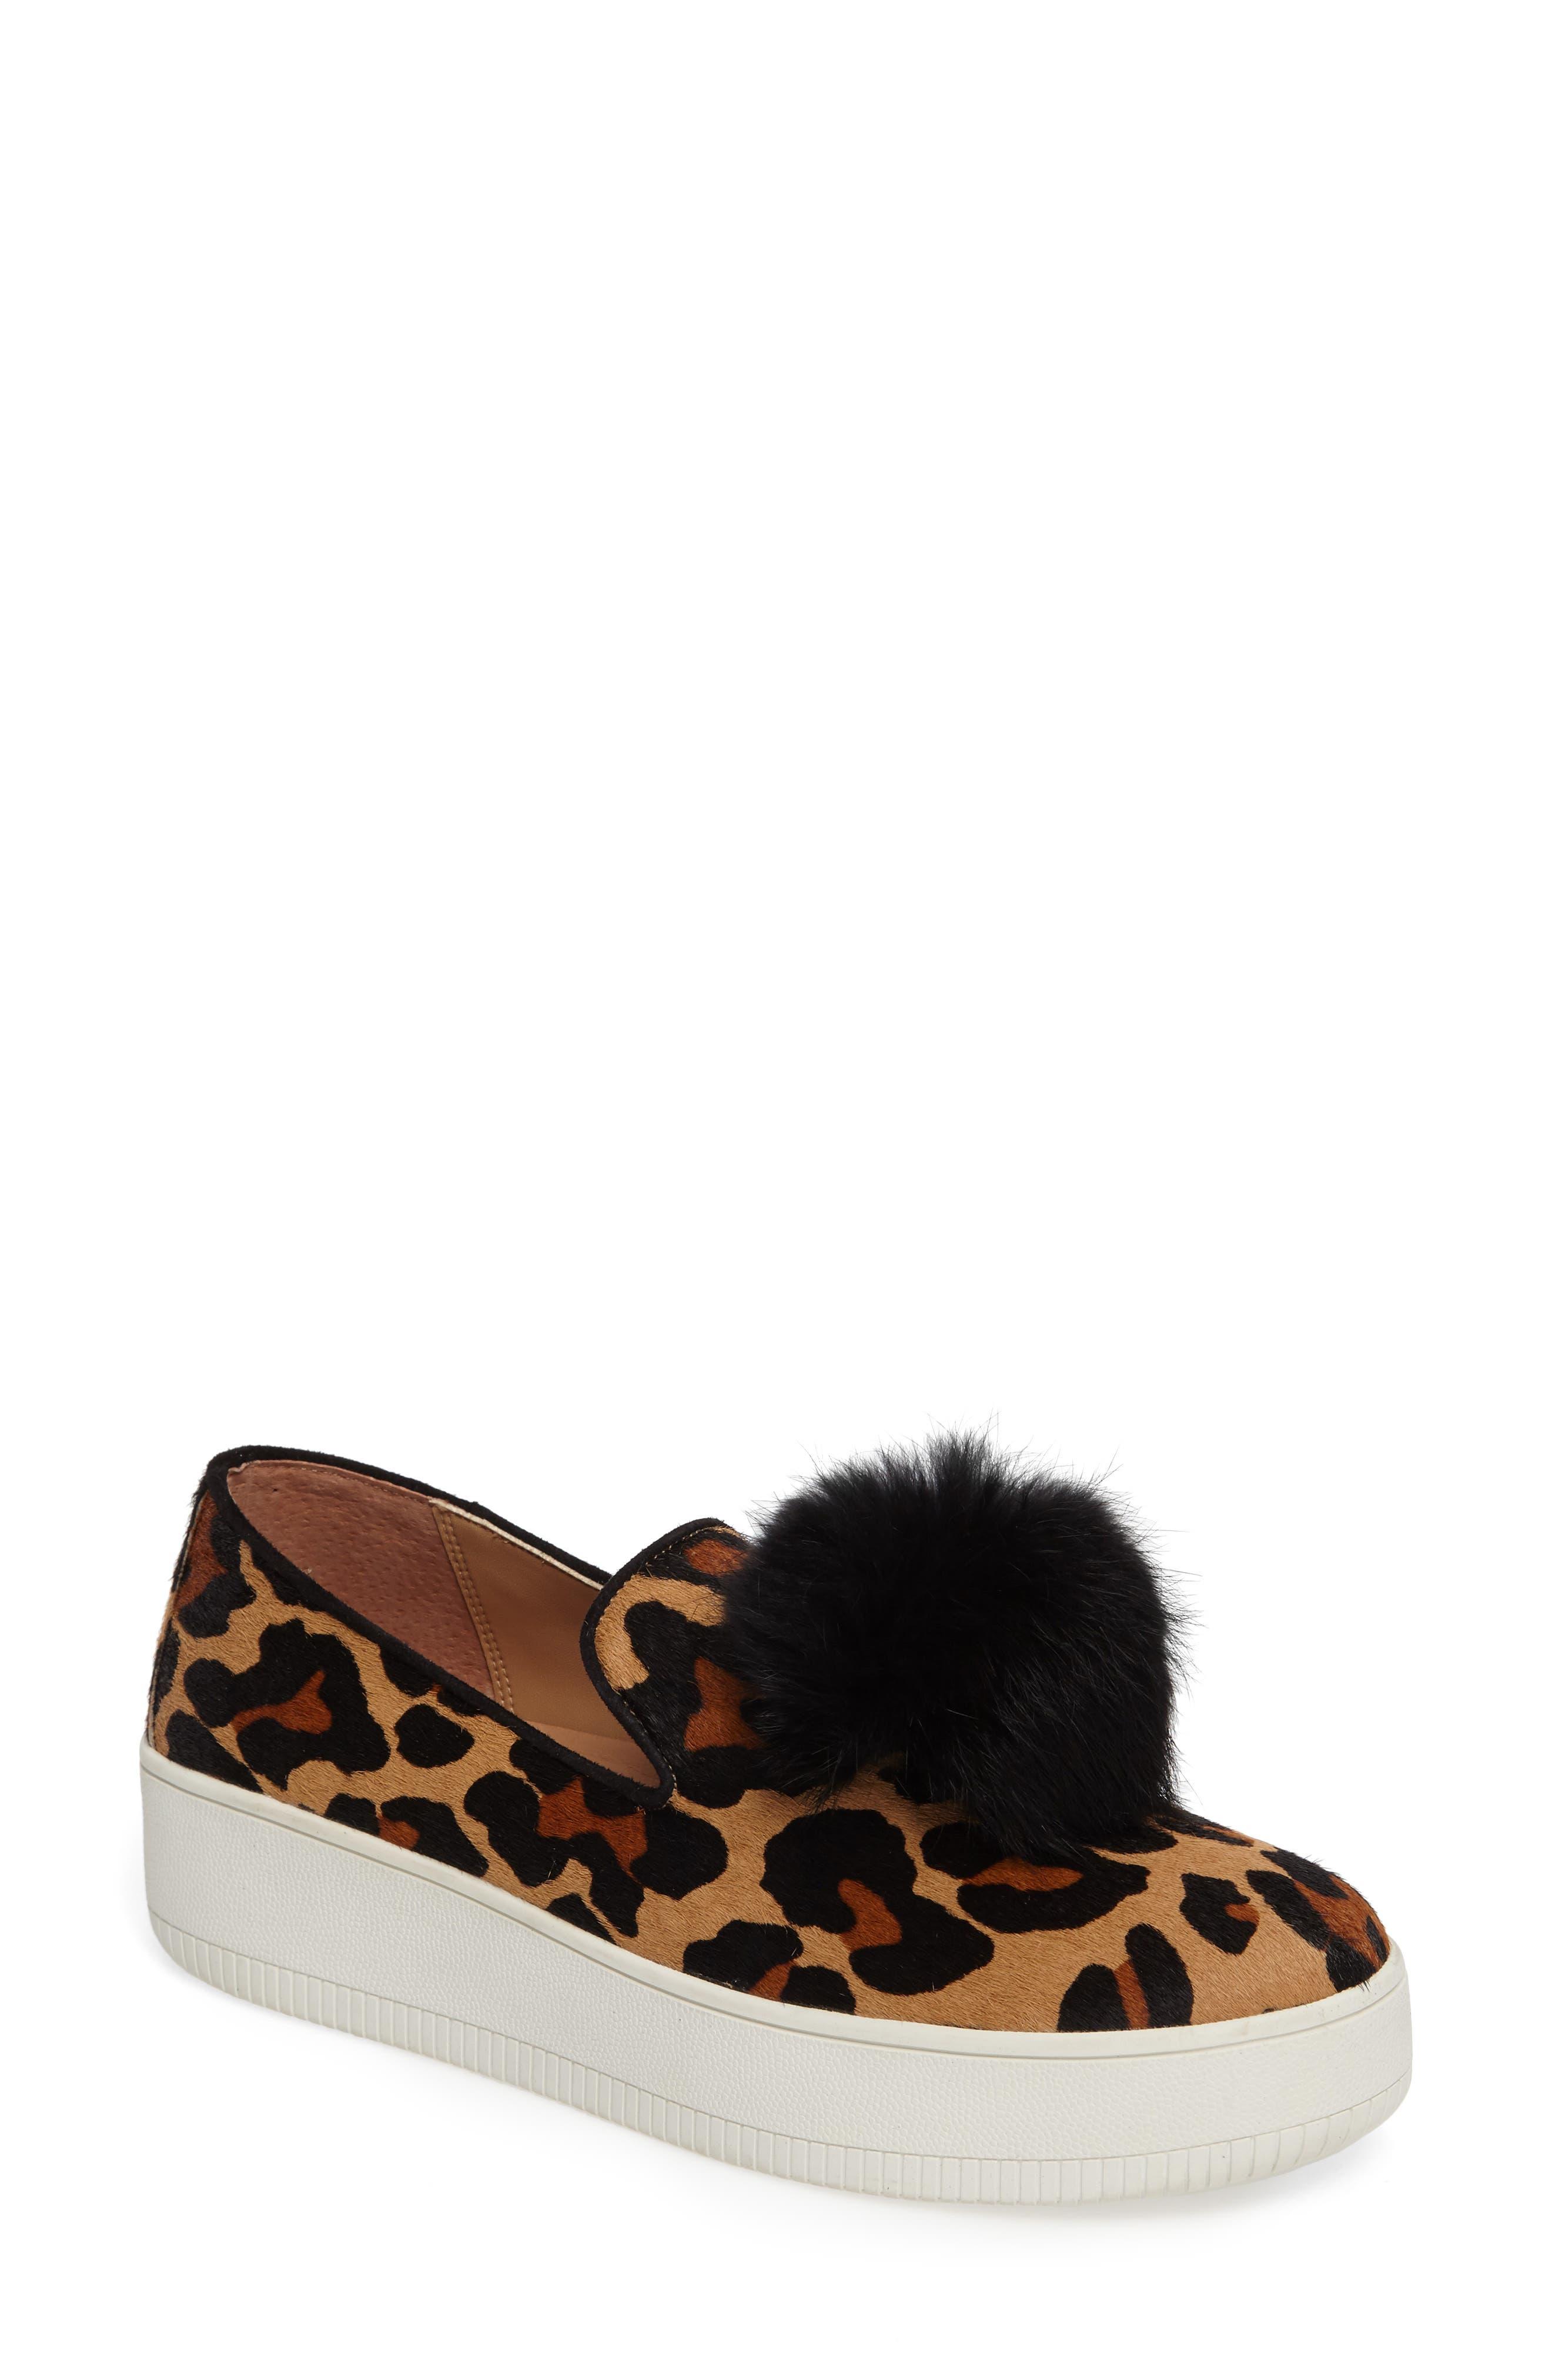 Sammy II Genuine Calf Hair Platform Sneaker with Genuine Rabbit Fur Trim, Main, color, 215